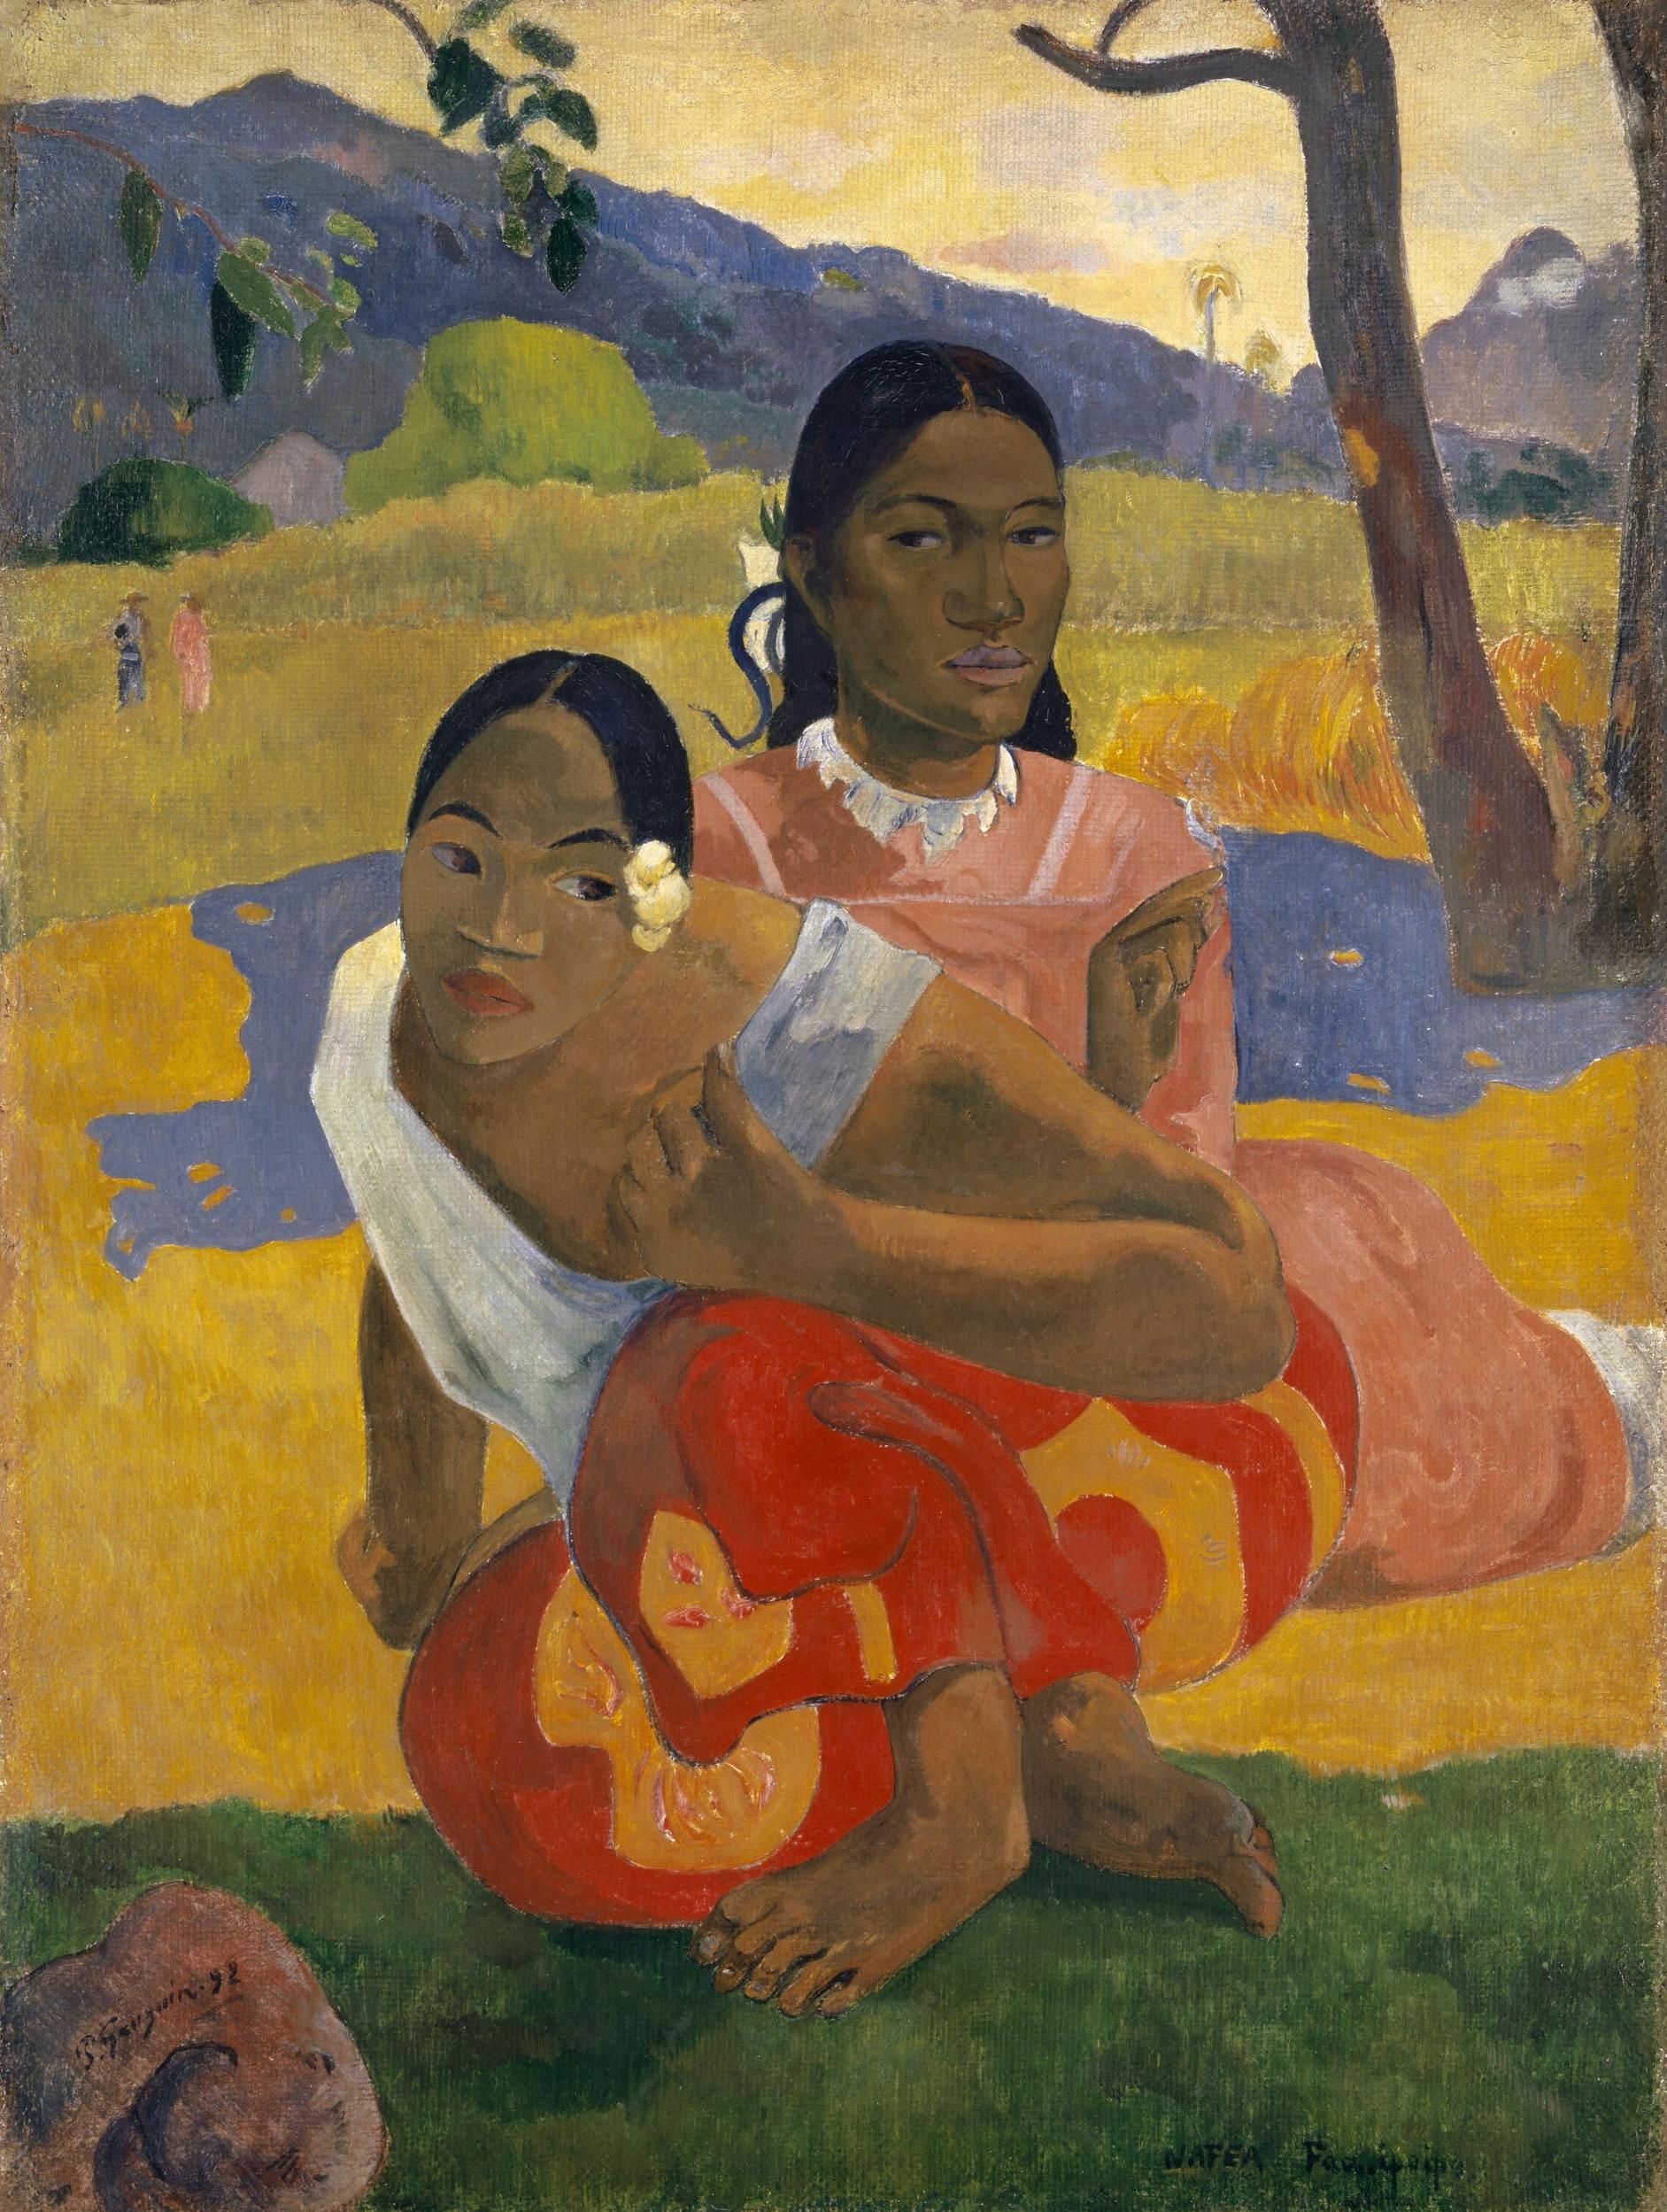 gauguin-nafea_faa_ipoipo - Nafea Faa Ipoipo? - Lifestyle, Culture and Arts